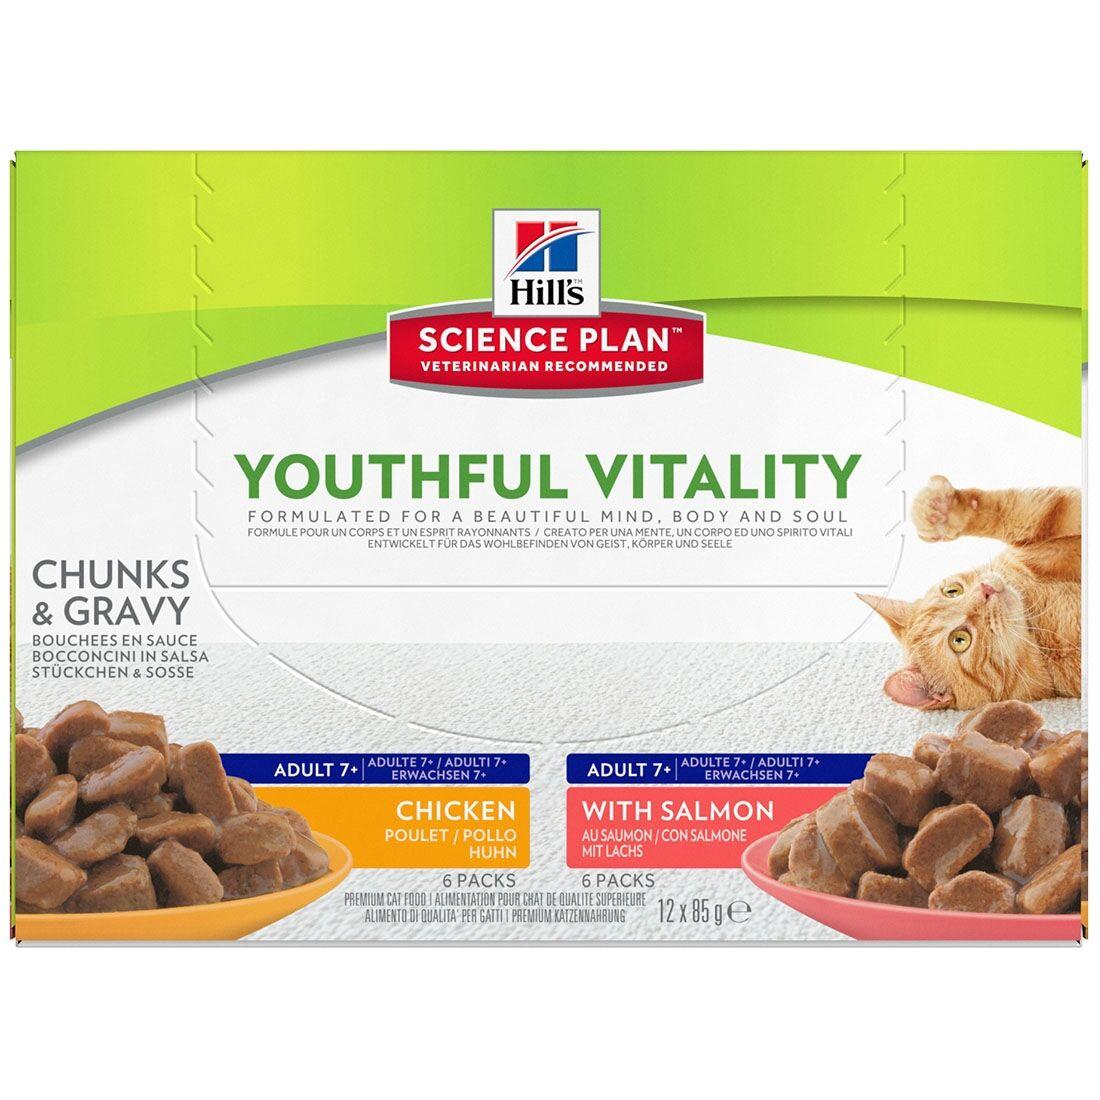 Hill's Science Plan Sachets Repas Hill's Science Plan Youthful Vitality Feline Mature Adult Contenance : 12 sachets de 85 g, Saveur : 6 x Chicken + 6 x Salmon